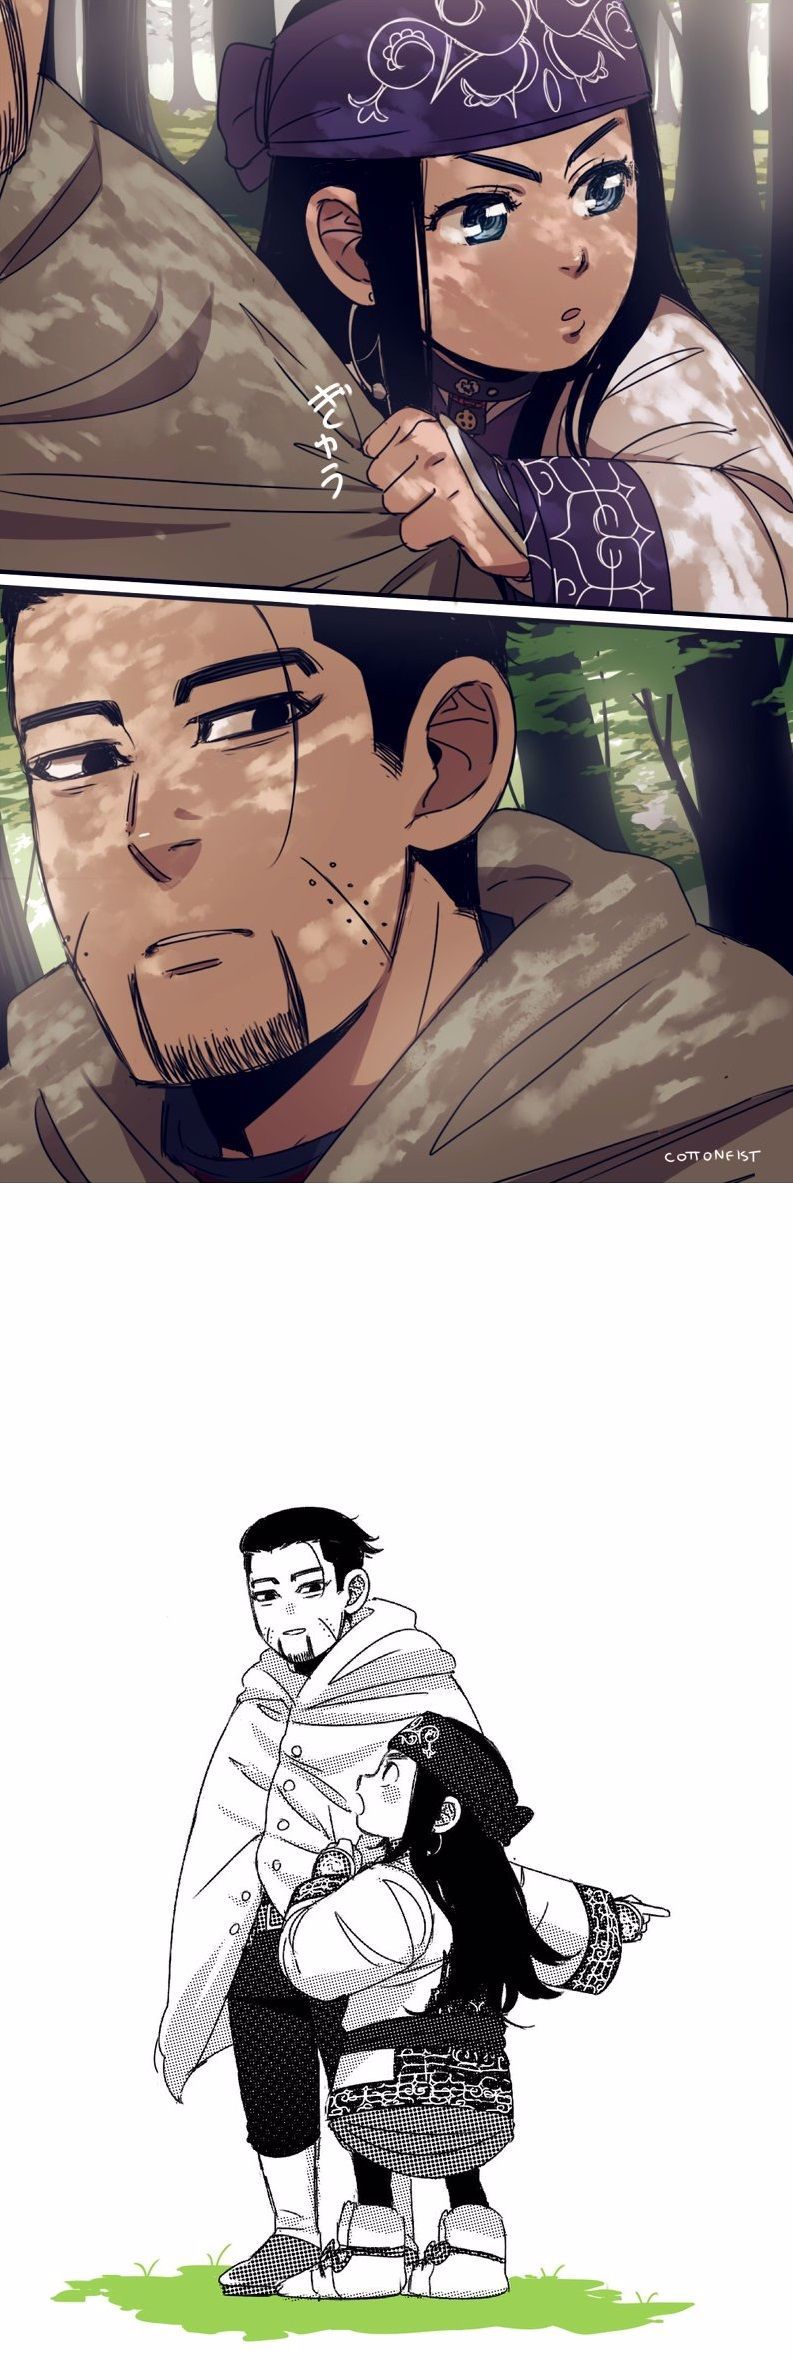 Pin by Leaf Noyes on Golden Kamuy in 2020 Anime, Manga